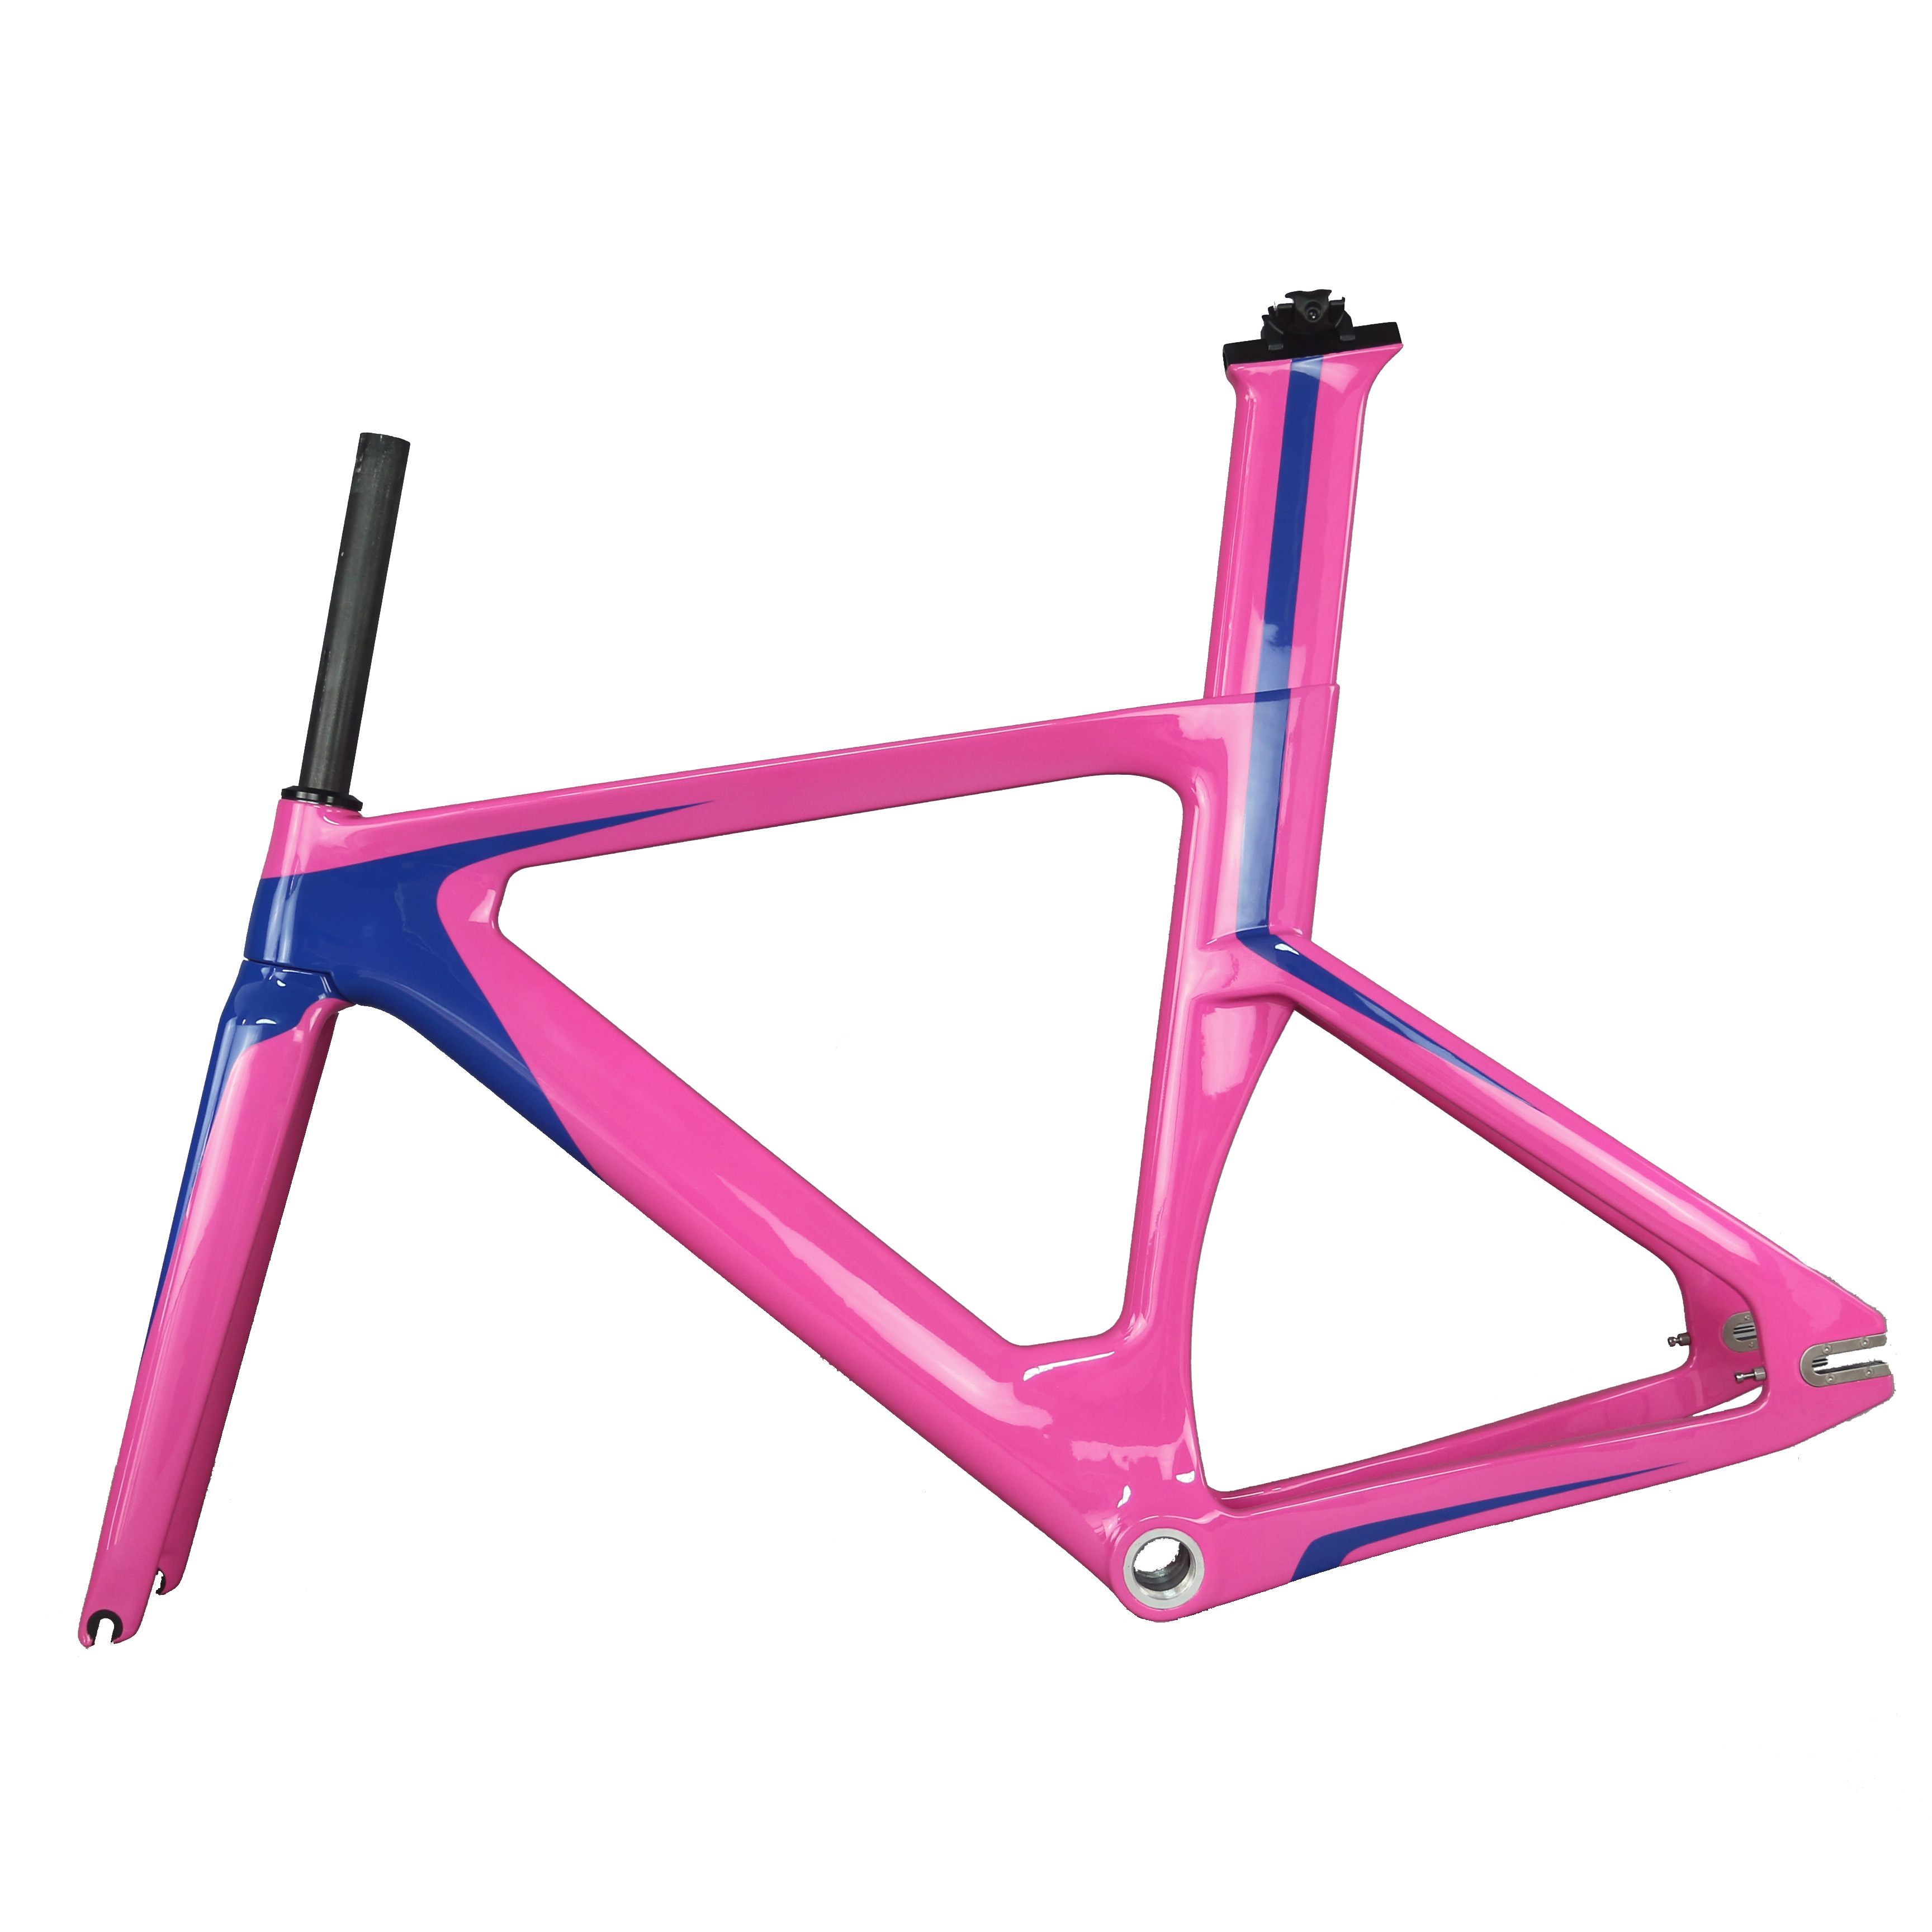 2019 Toray Carbon Fiber  T800  Track Frame Road Frames Fixed Gear Bike Frameset With Fork Seat Post  Bicycle Frame TR013